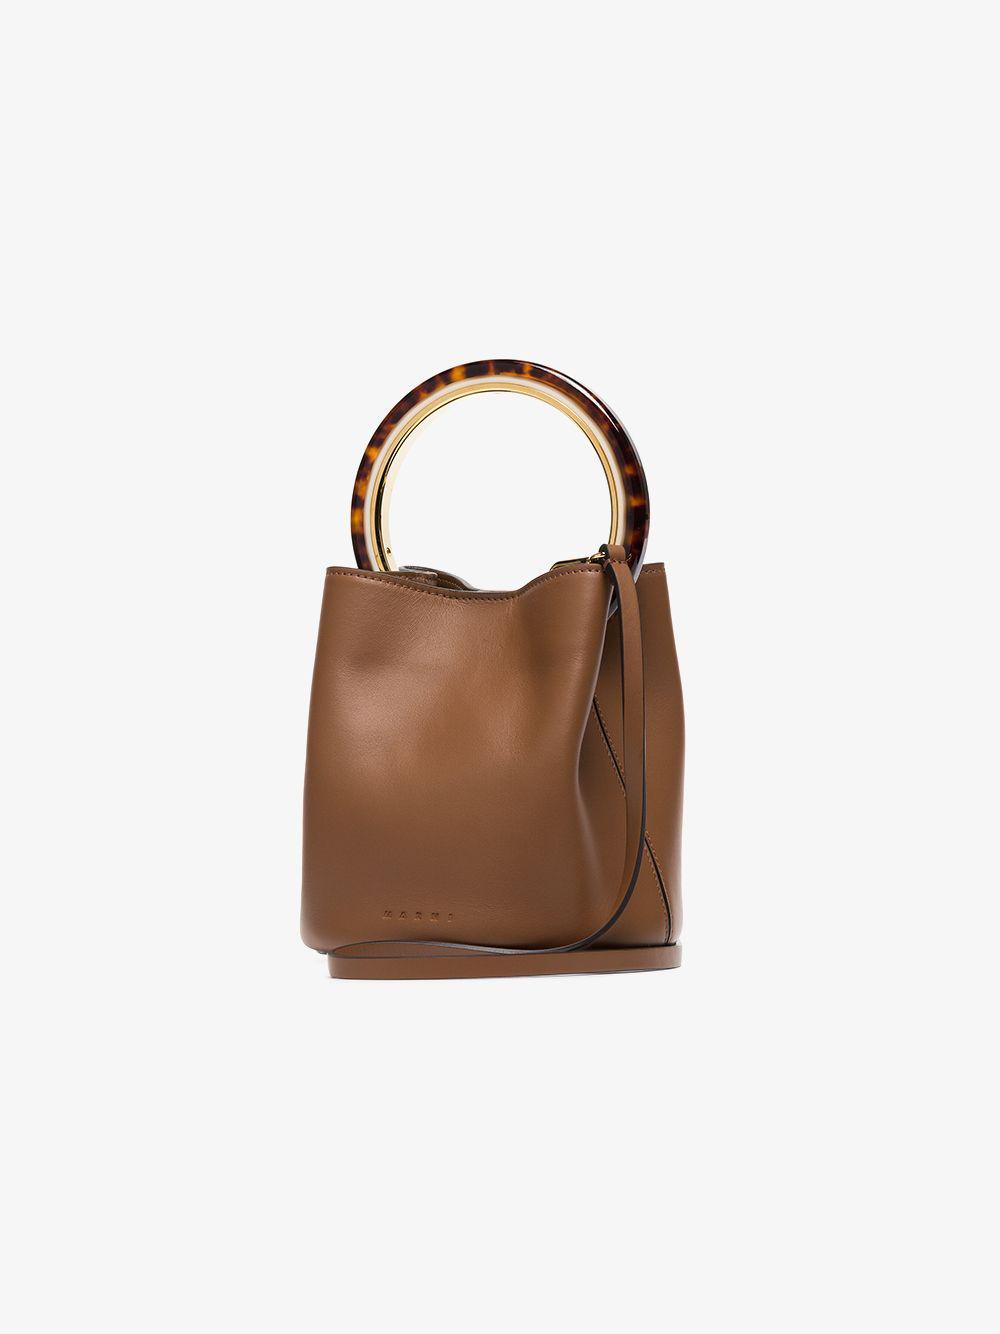 Bag Marni In Bucket Lyst Pannier Handle Brown Leather Resin ZOPkiTXu